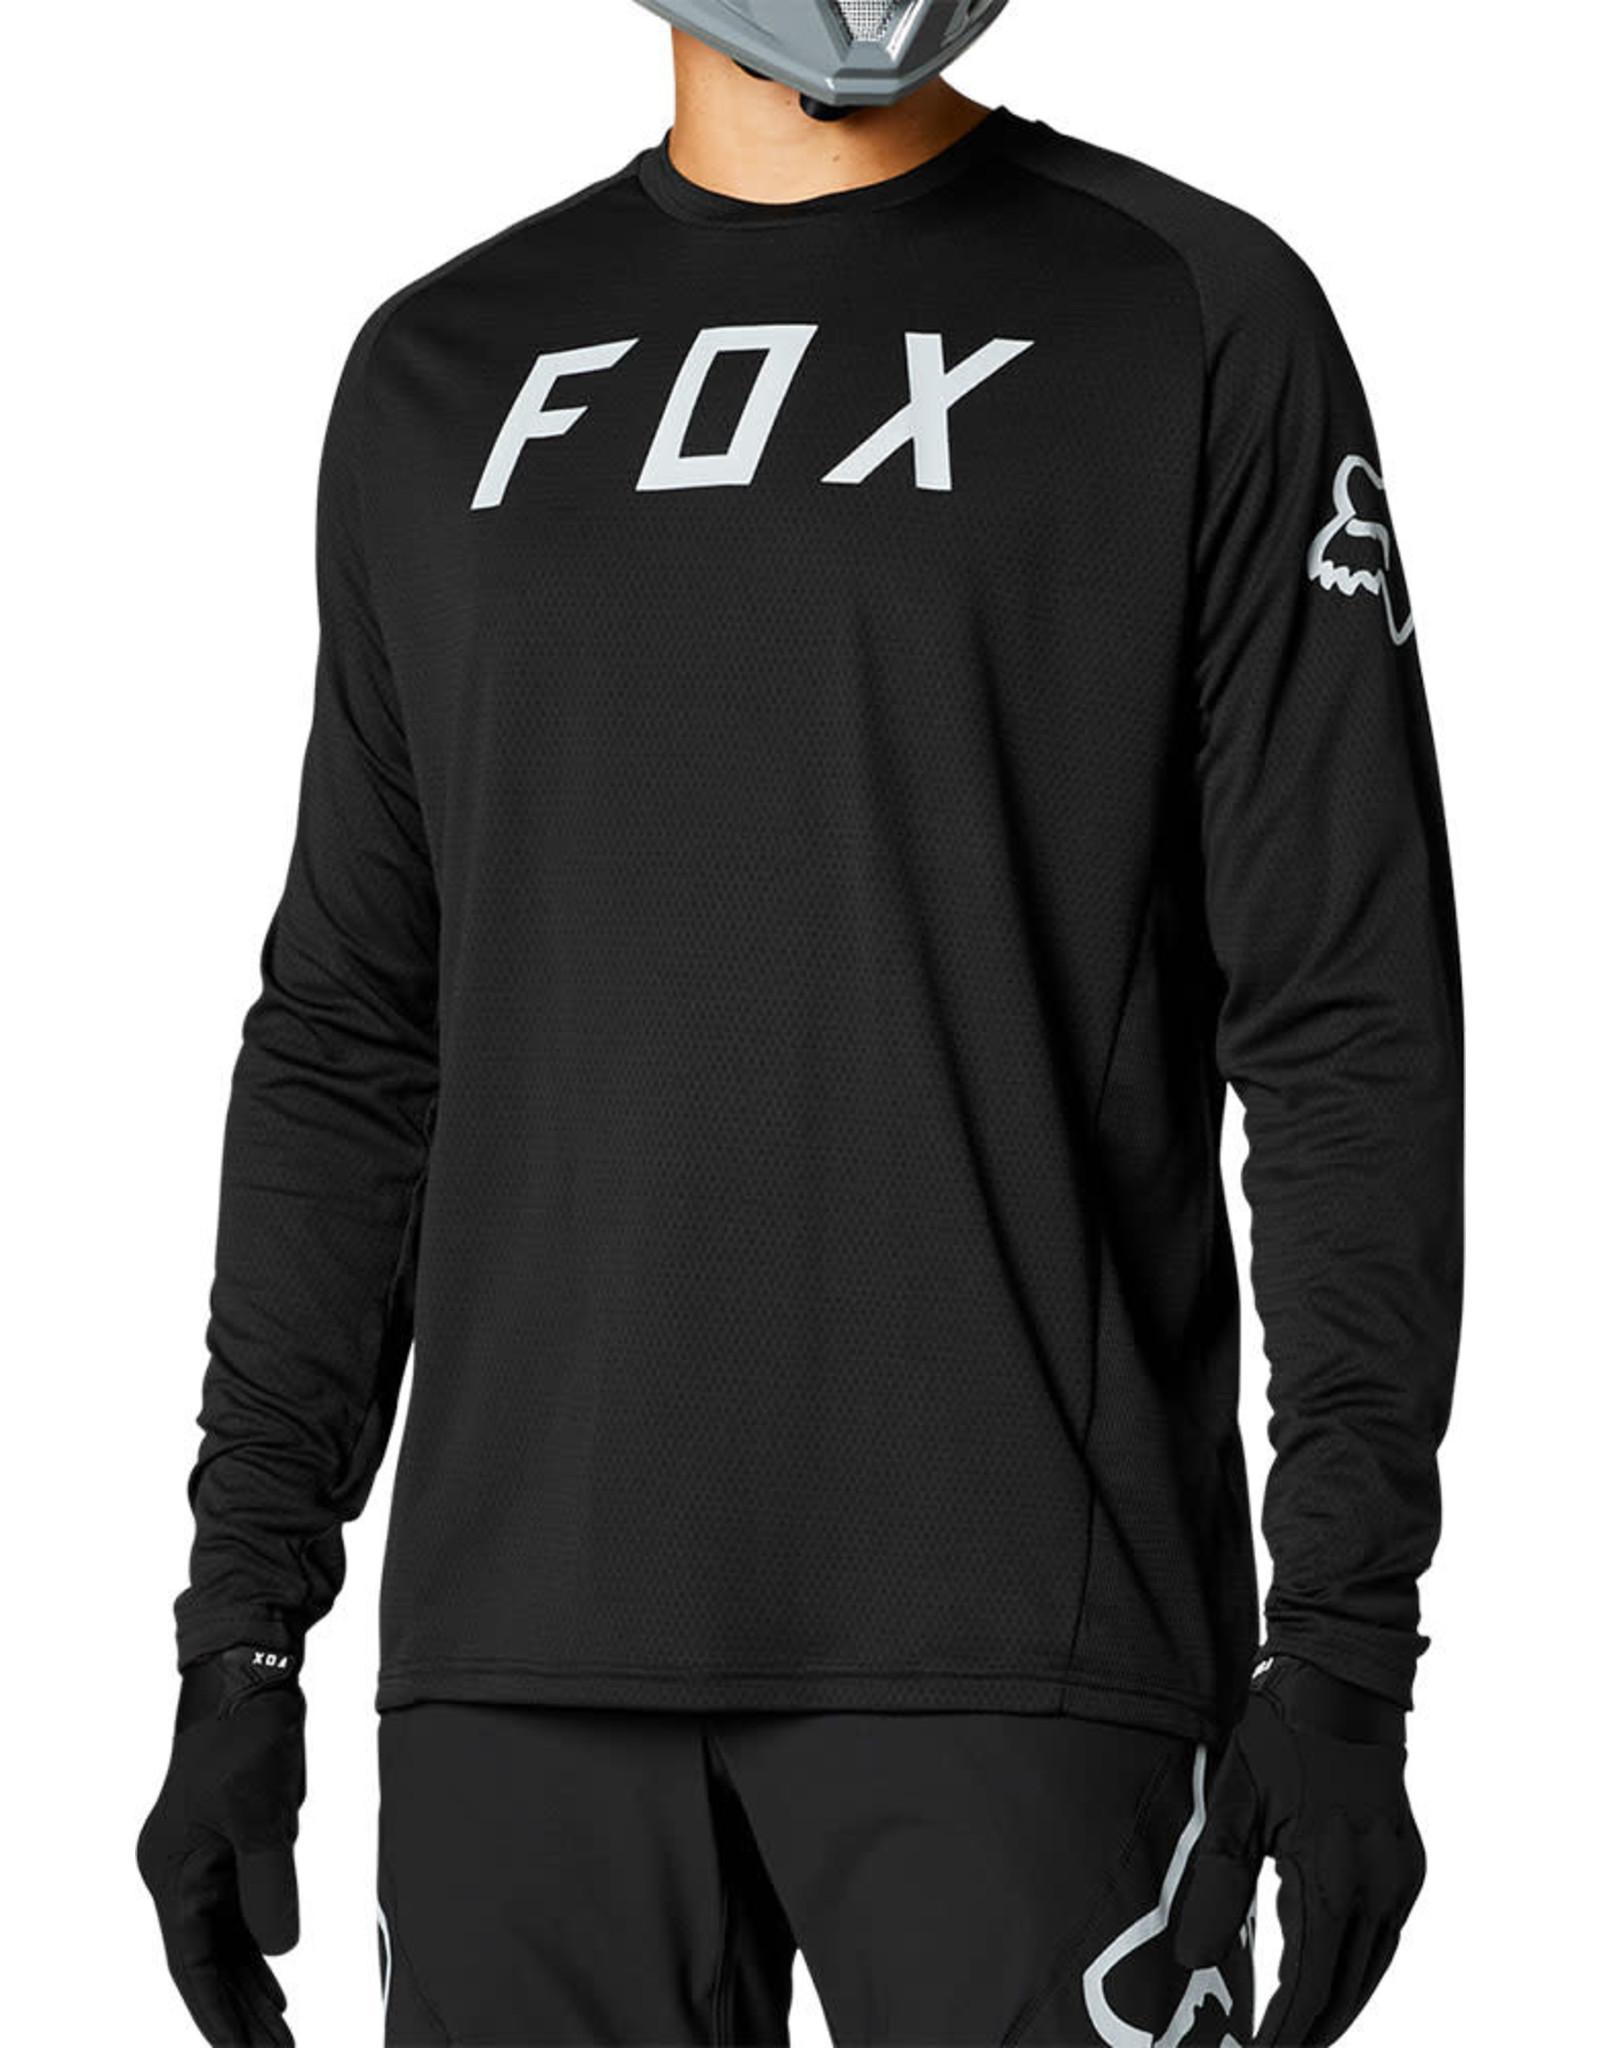 FOX DEFEND LS JERSEY 2XL